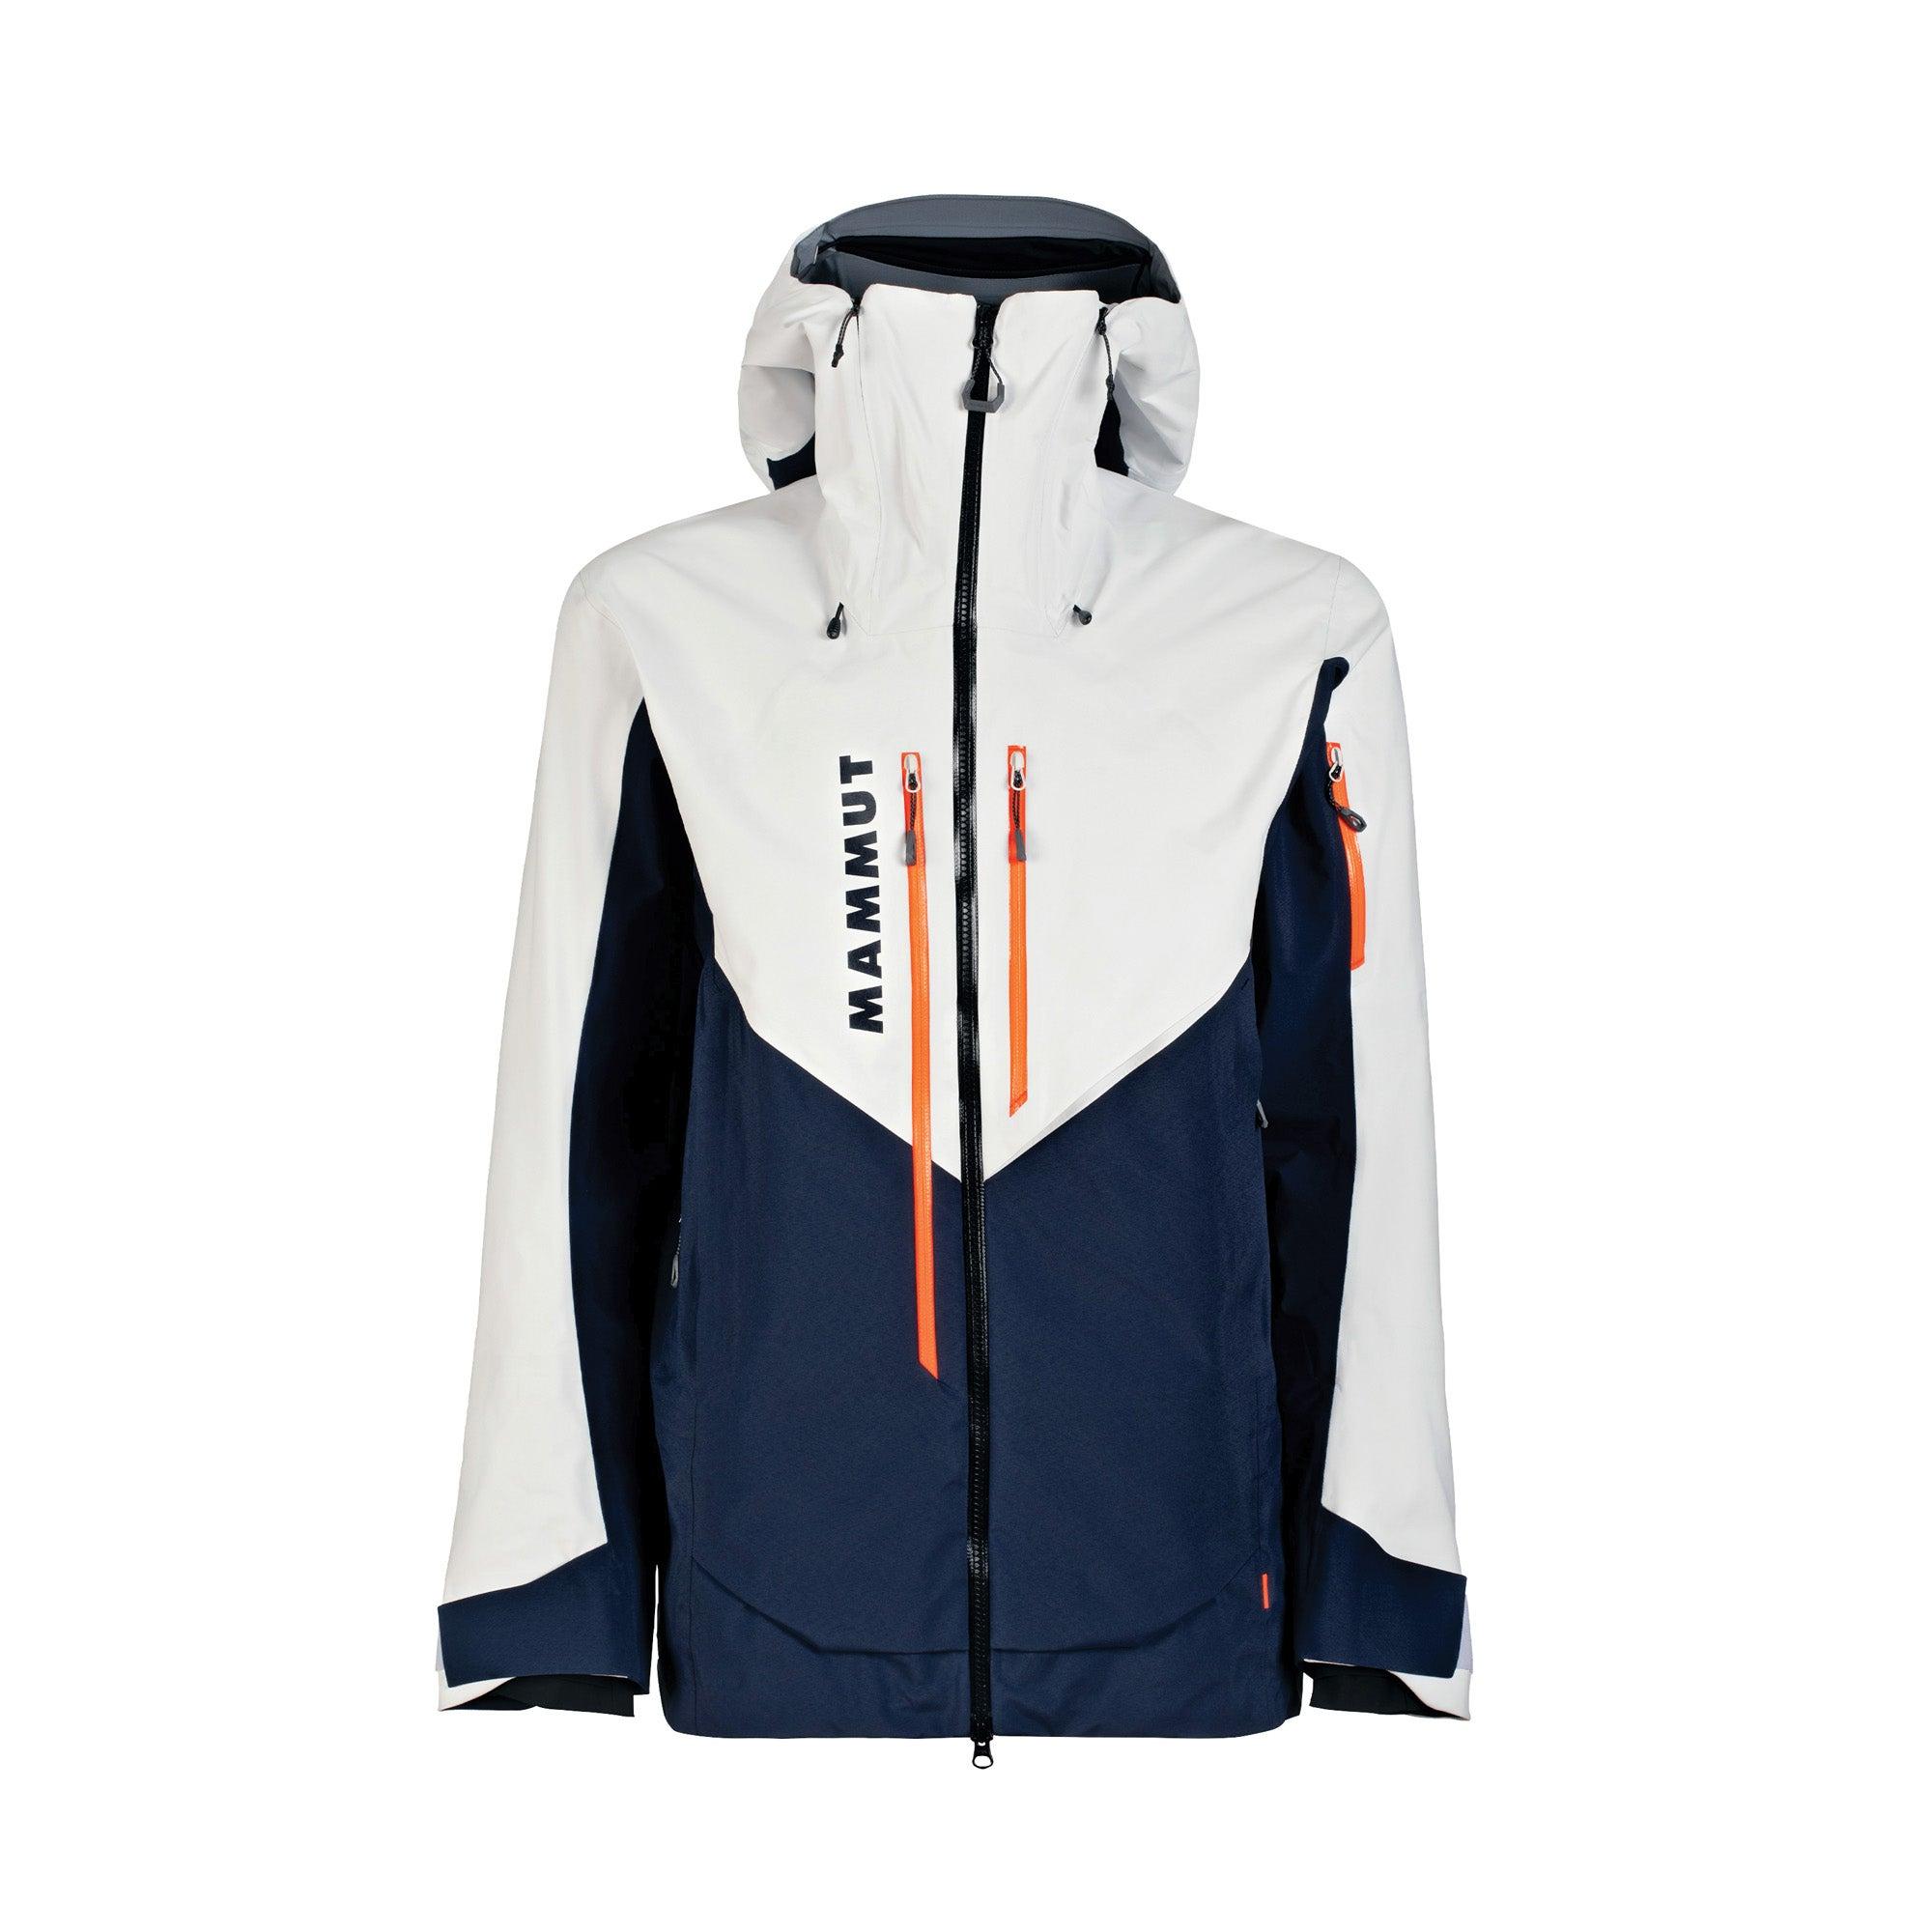 2021 Mammut La Liste Jacket